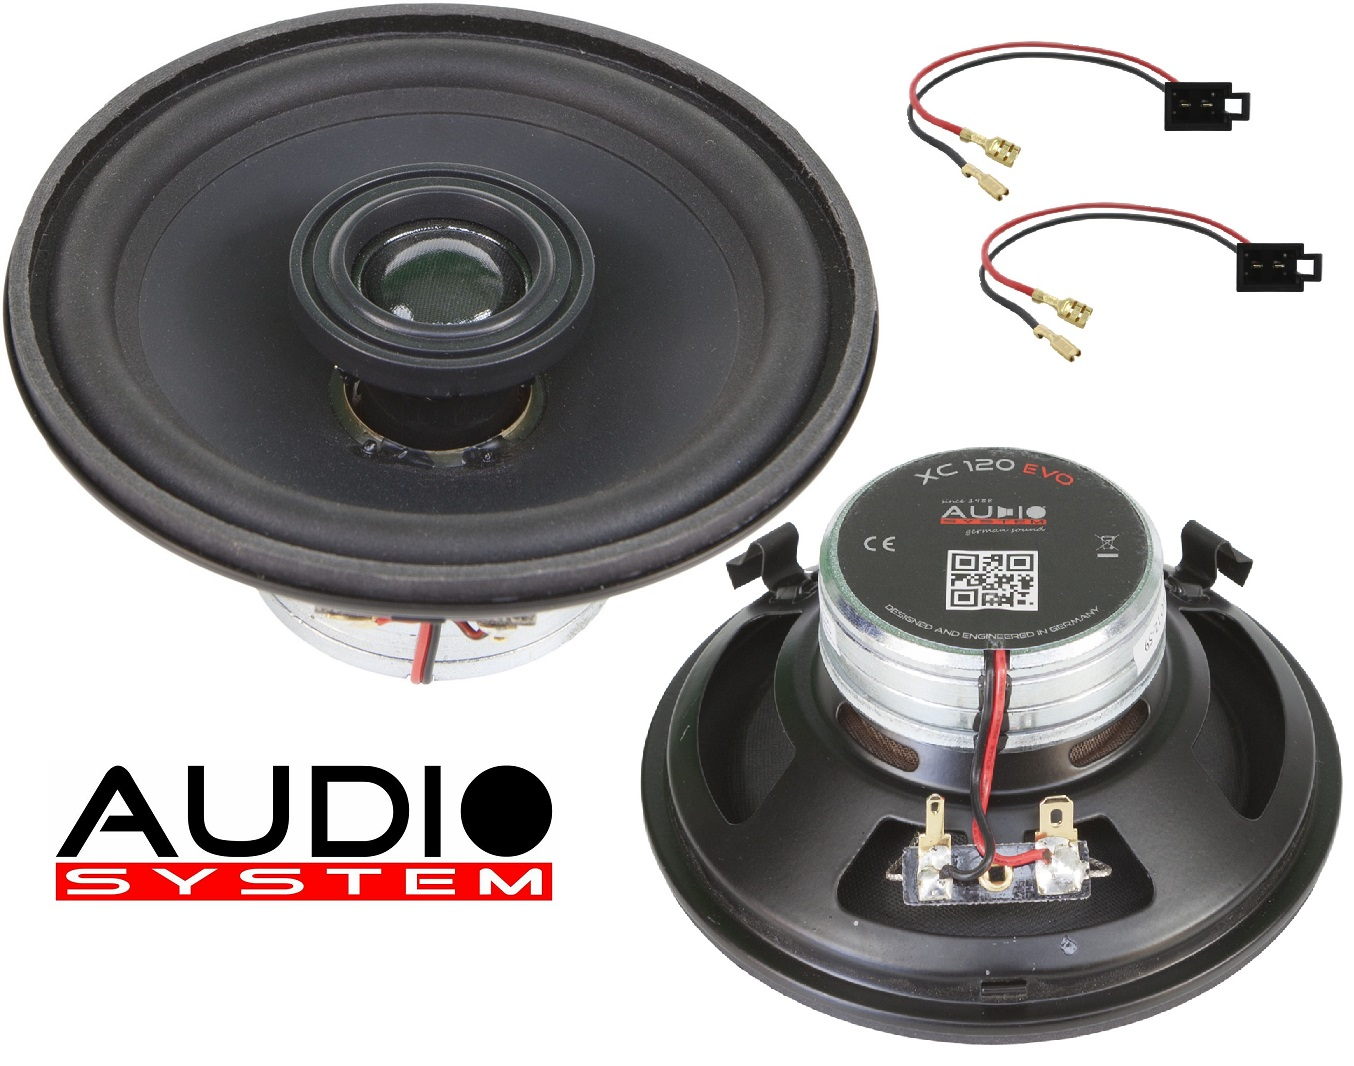 Audio System XCFIT VW T4 REAR EVO Lautsprecher X-SERIES Neodym Spezial Coaxial System 12cm 1 Paar